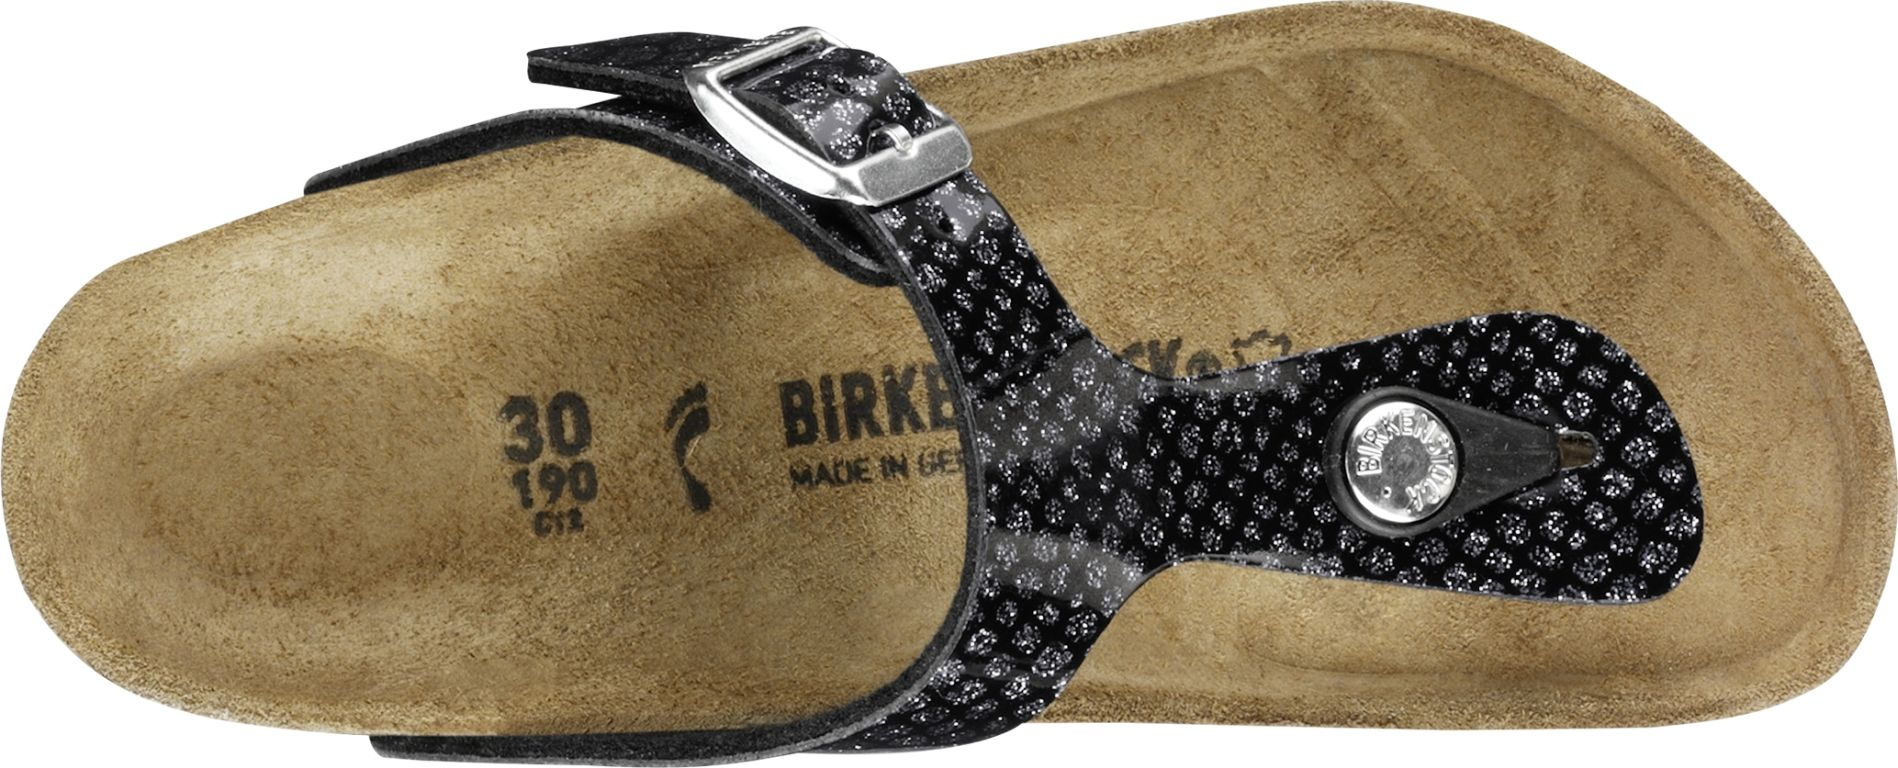 8dc17b2715e2 ... Preview  Birkenstock Gizeh Kids Magic Snake Black-Silver